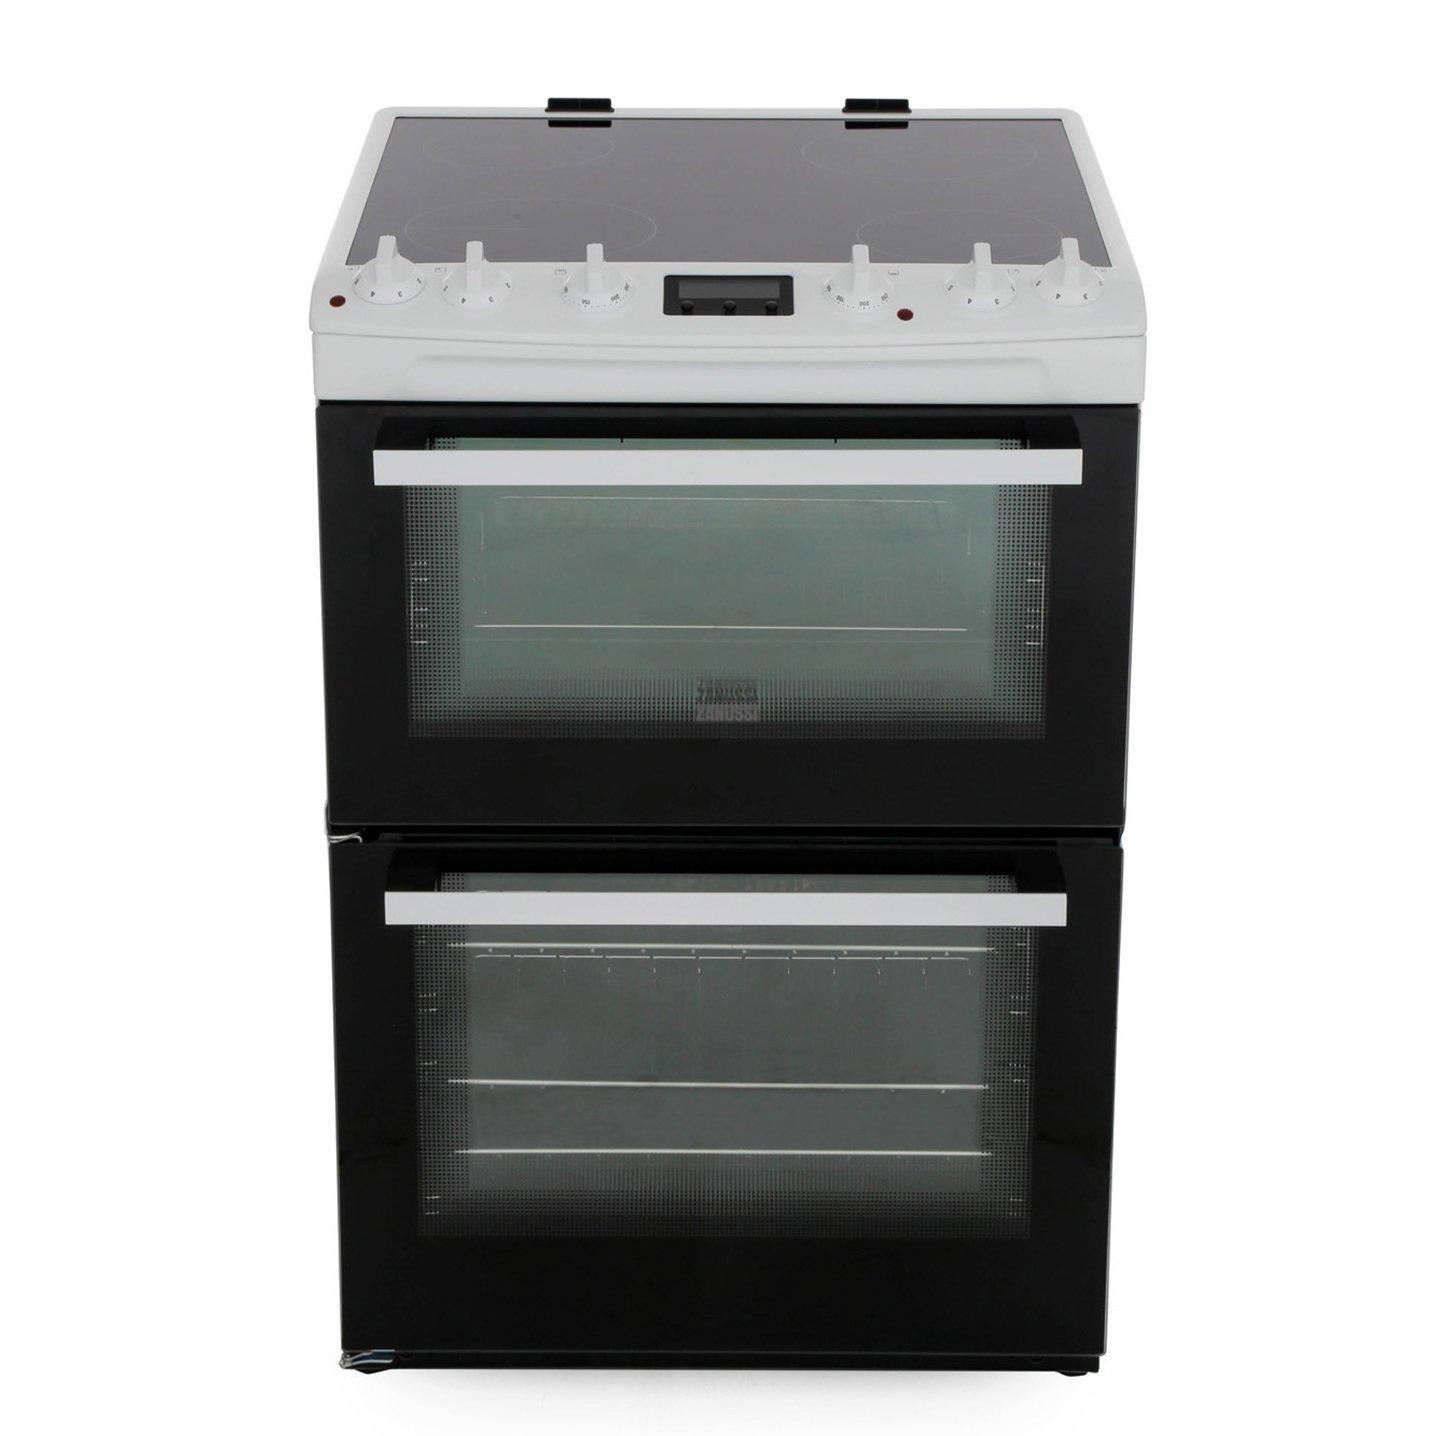 Zanussi ZCV66370WA Ceramic Electric Cooker with Double Oven